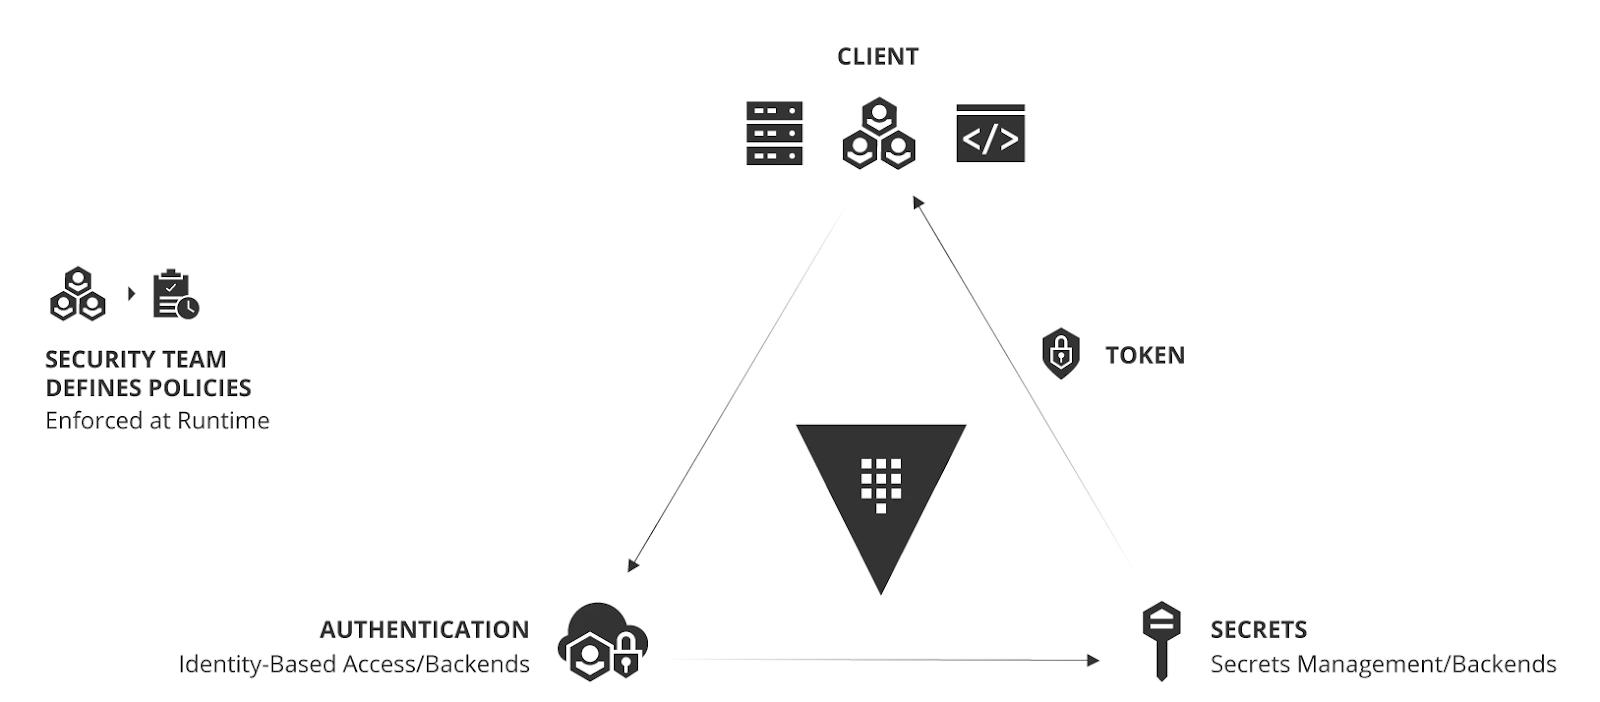 3 ways secrets management improves monitoring & observability